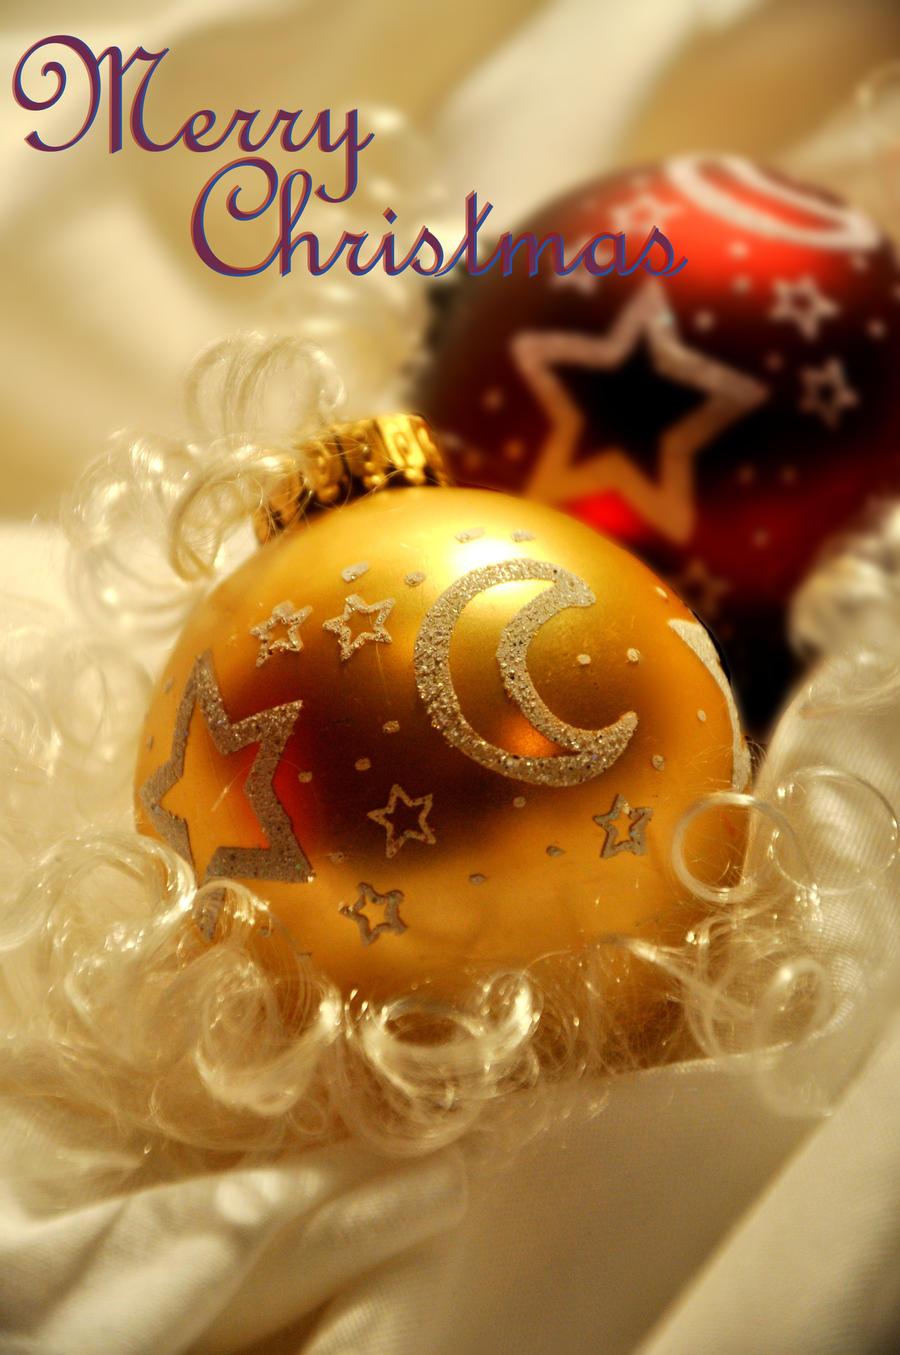 Merry Christmas by KiiiChan